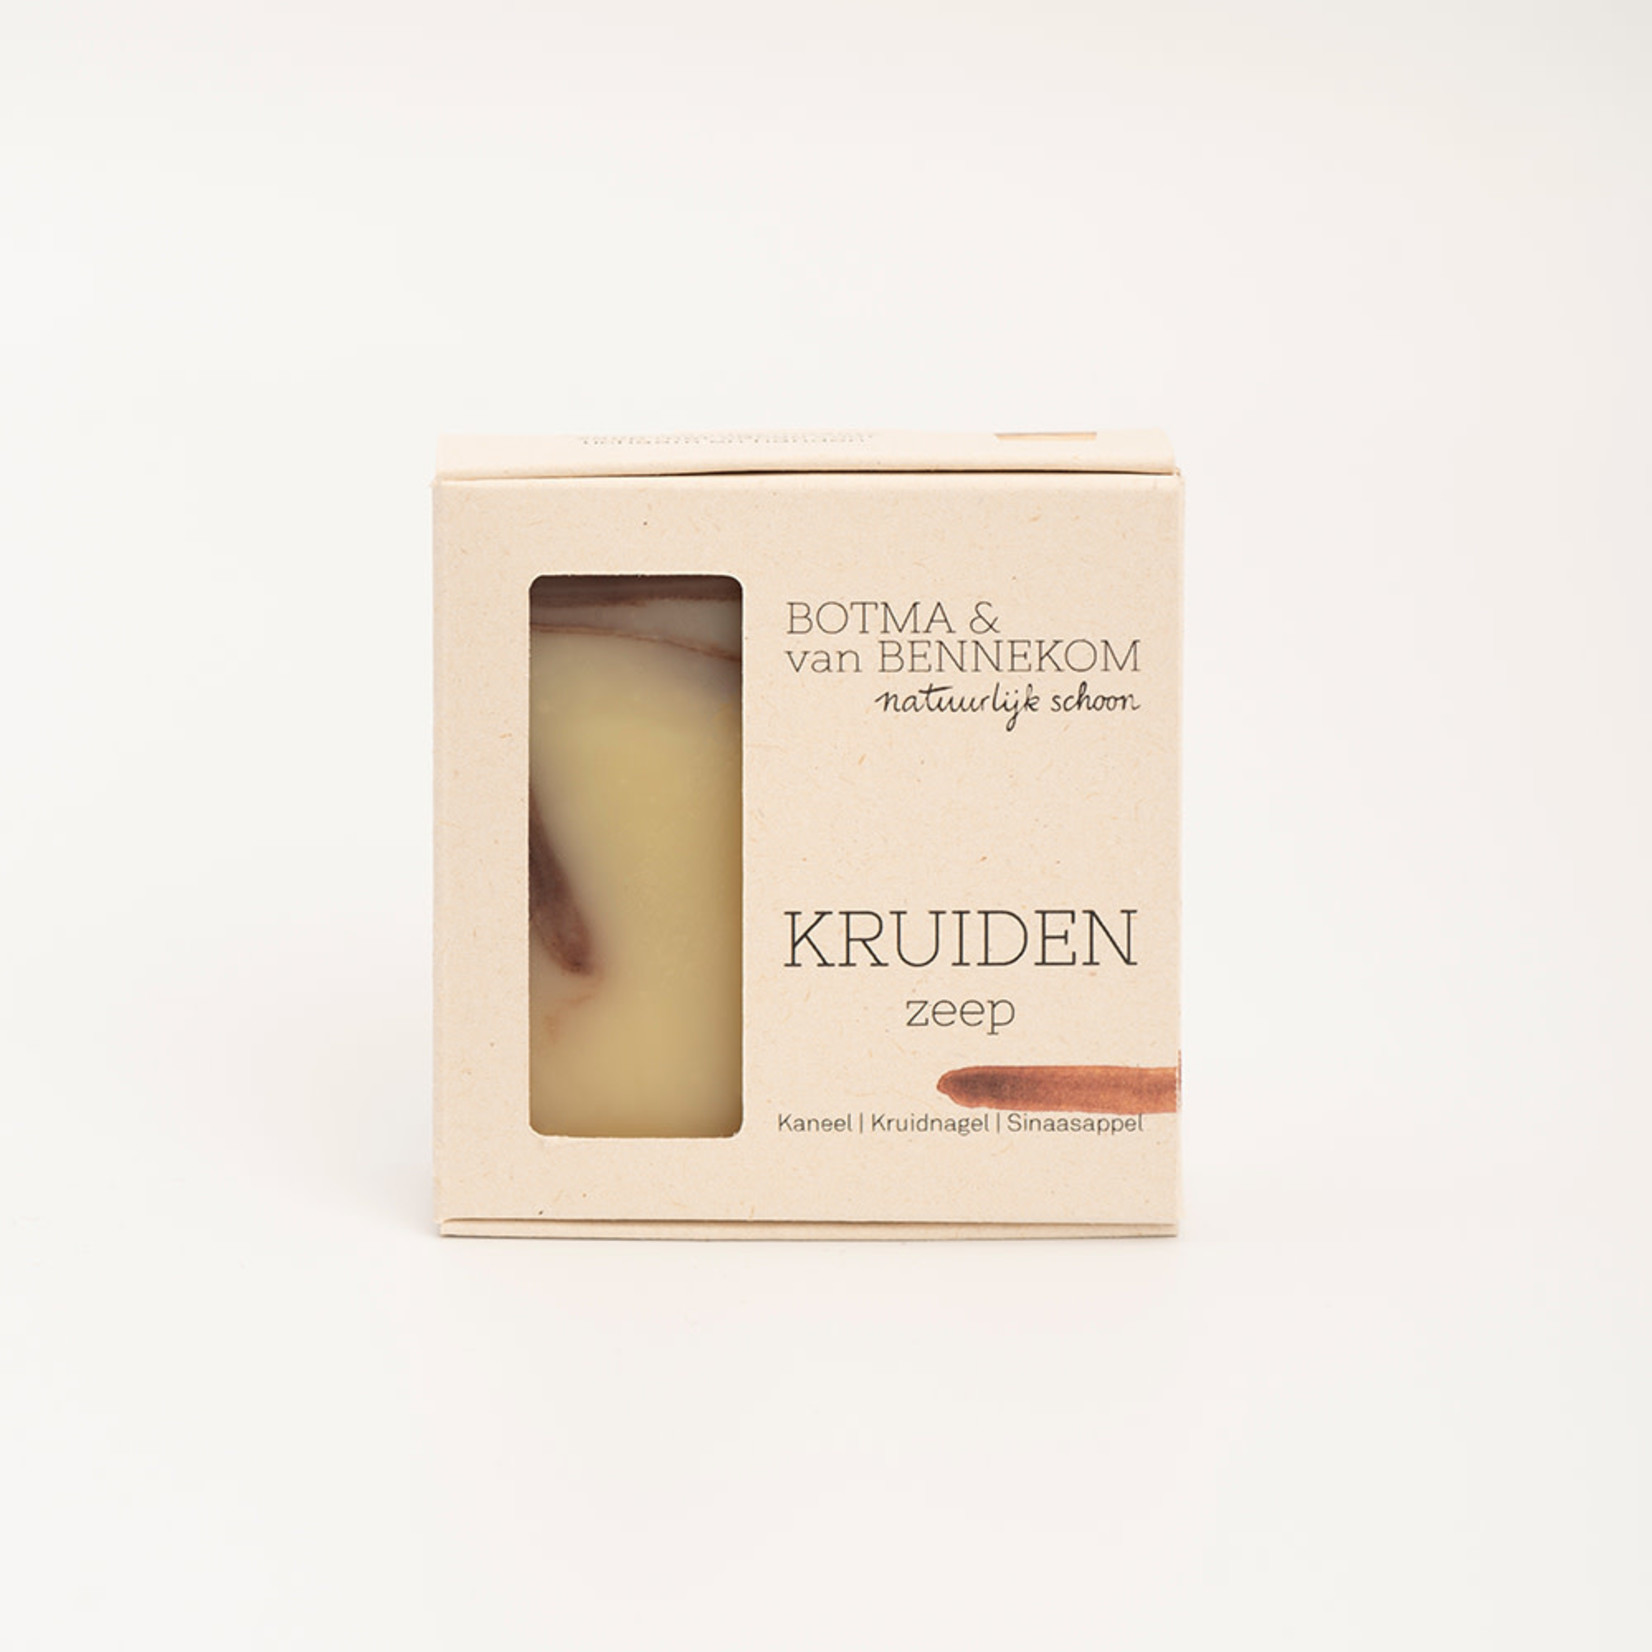 Botma & van Bennekom • kruidenzeep 100 g